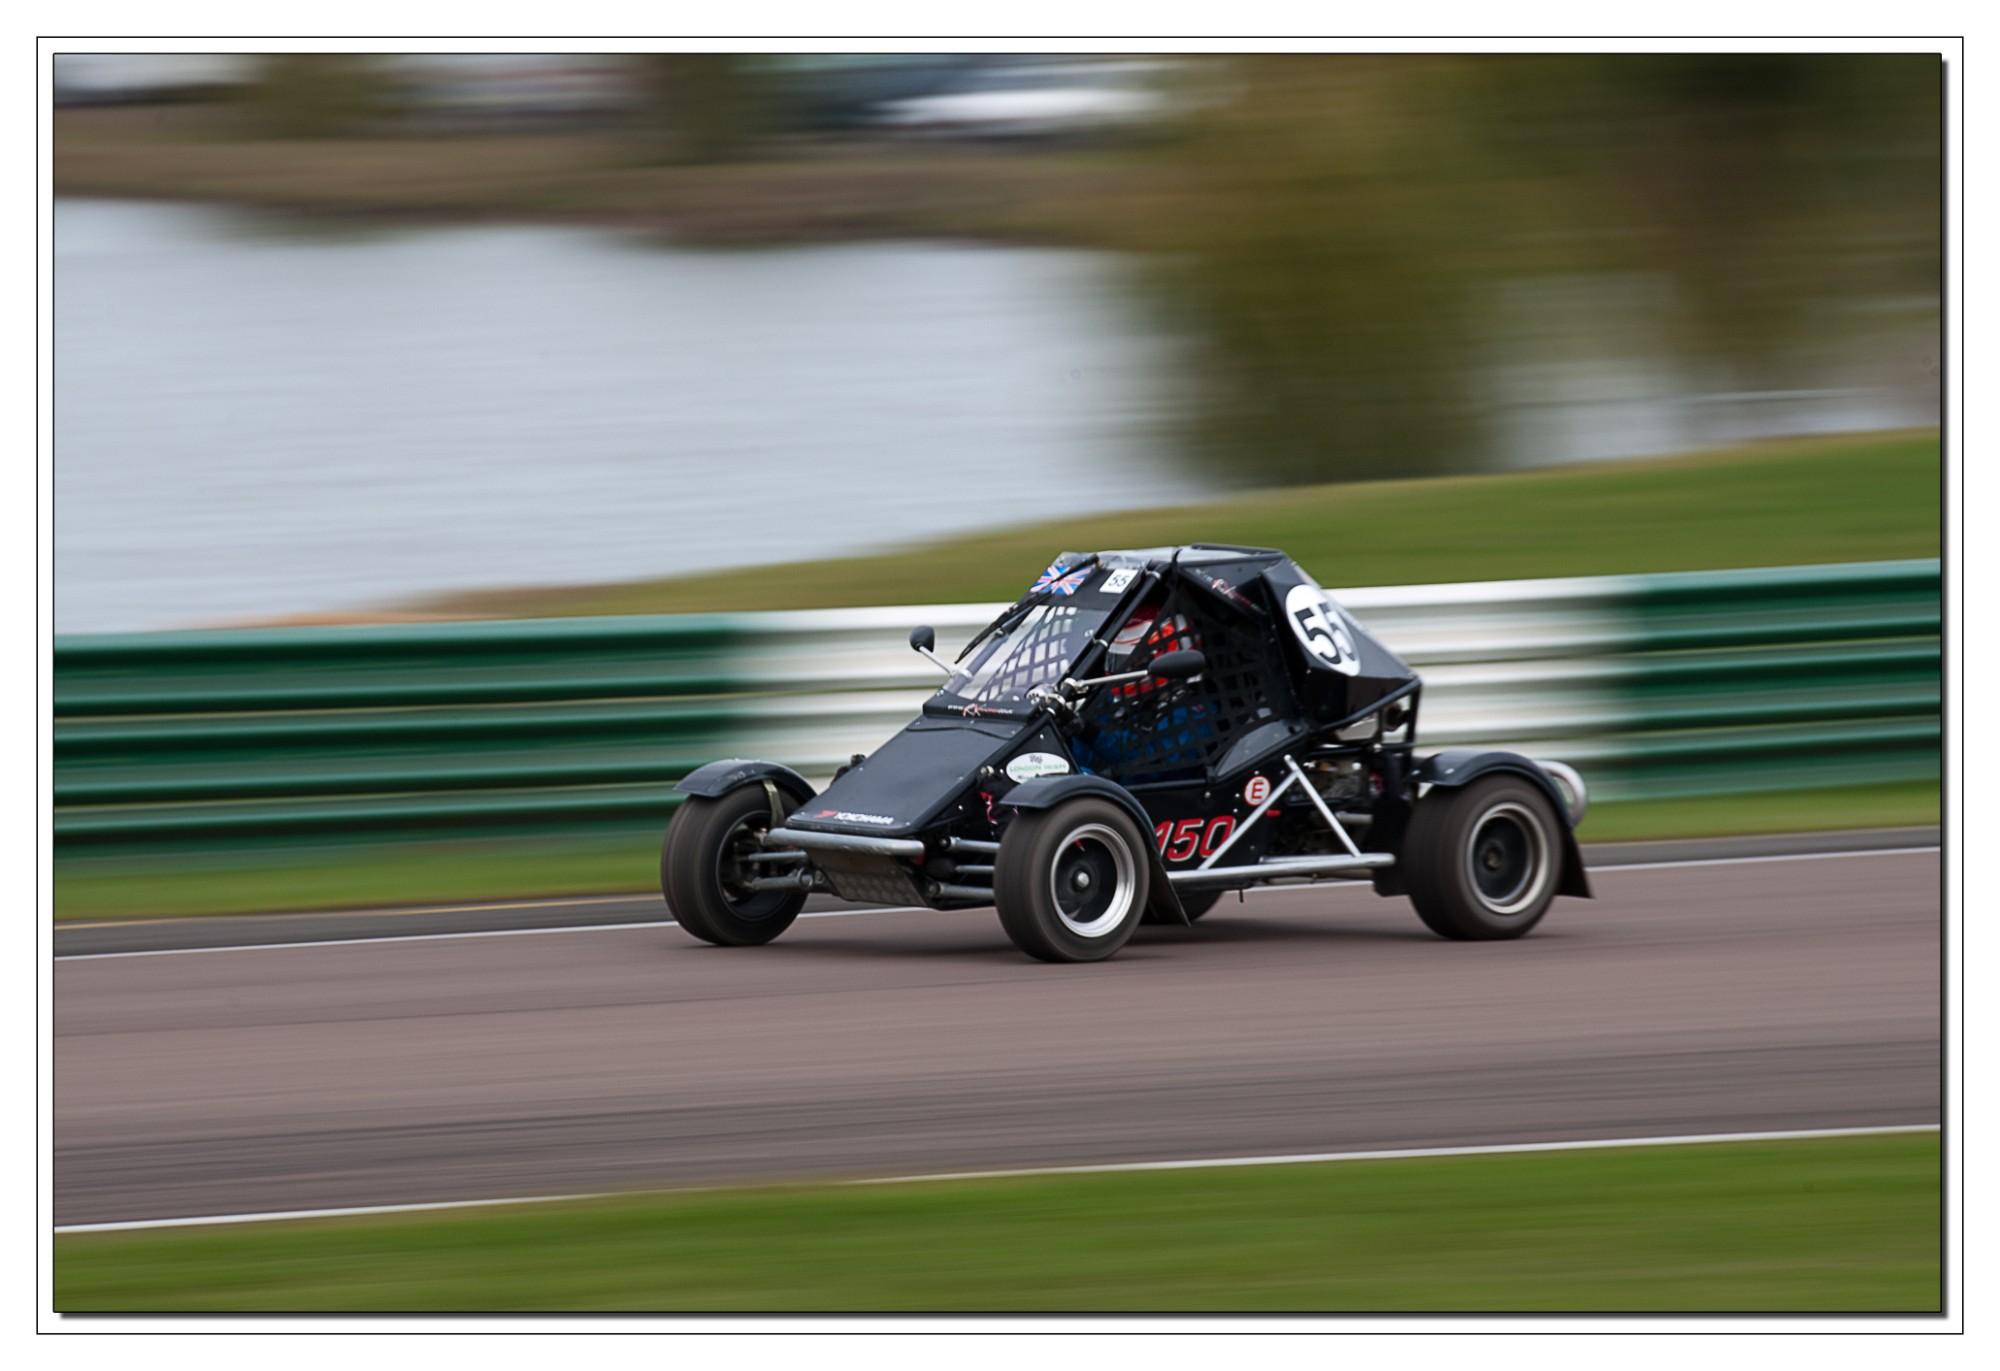 IMAGE: http://www.mark.colston-online.co.uk/Motorsport/Mallory%20Park/Rally%20Cross%202009/slides/IMG_5344%20EOS-1D%20Mark%20III%20copy.jpg